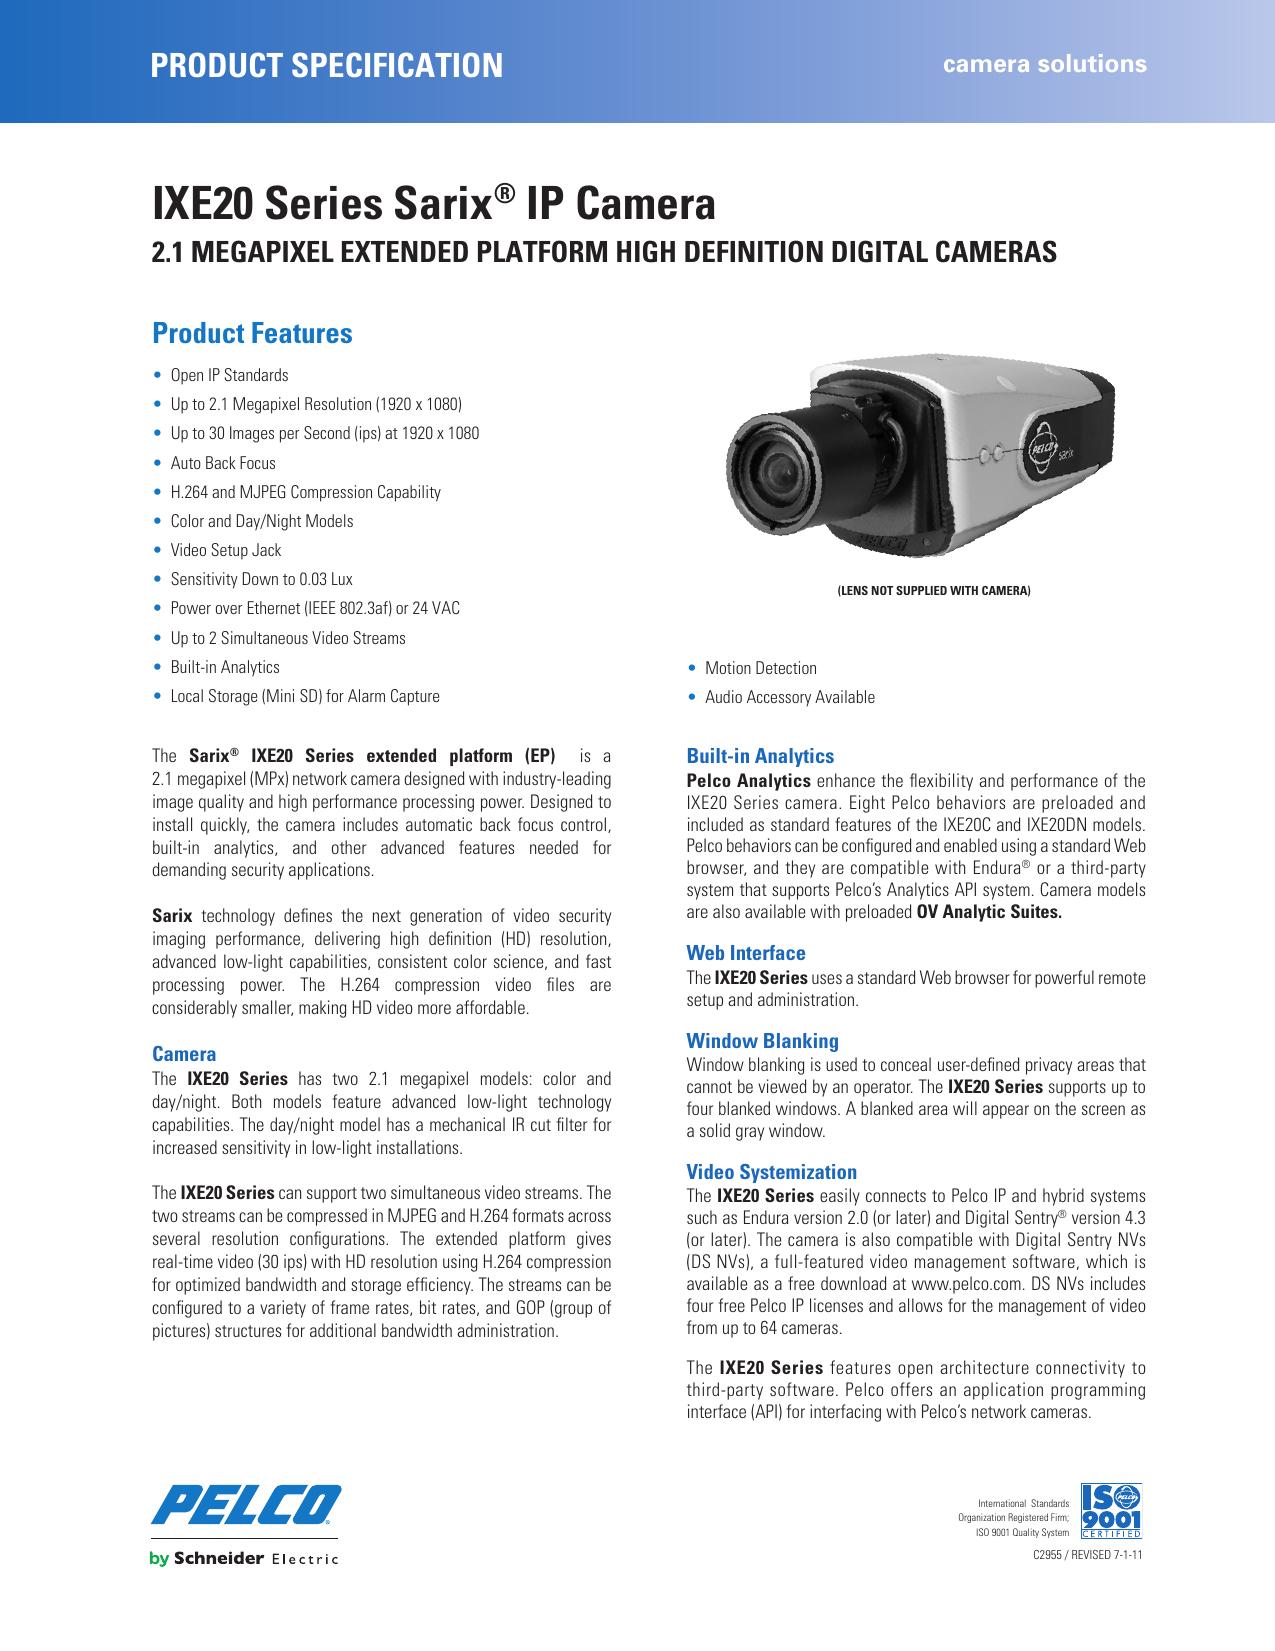 Pelco IXE20 IXE20_Series_Sarix_IP_Camera User Manual To The